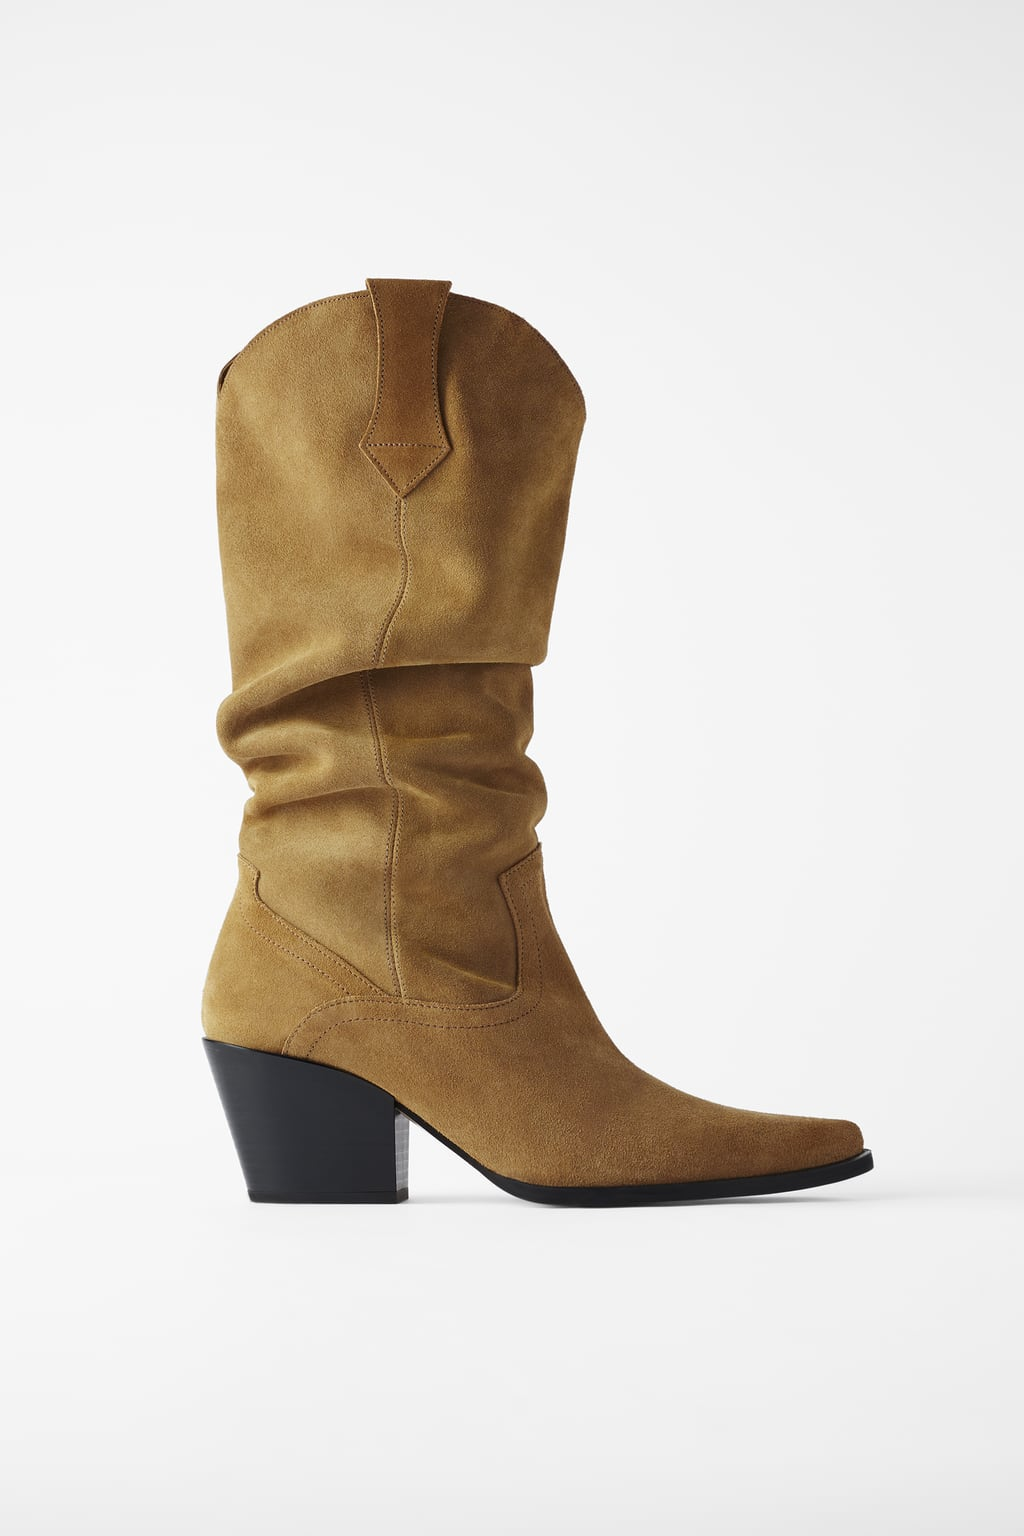 Zara Long Cowboy Boots